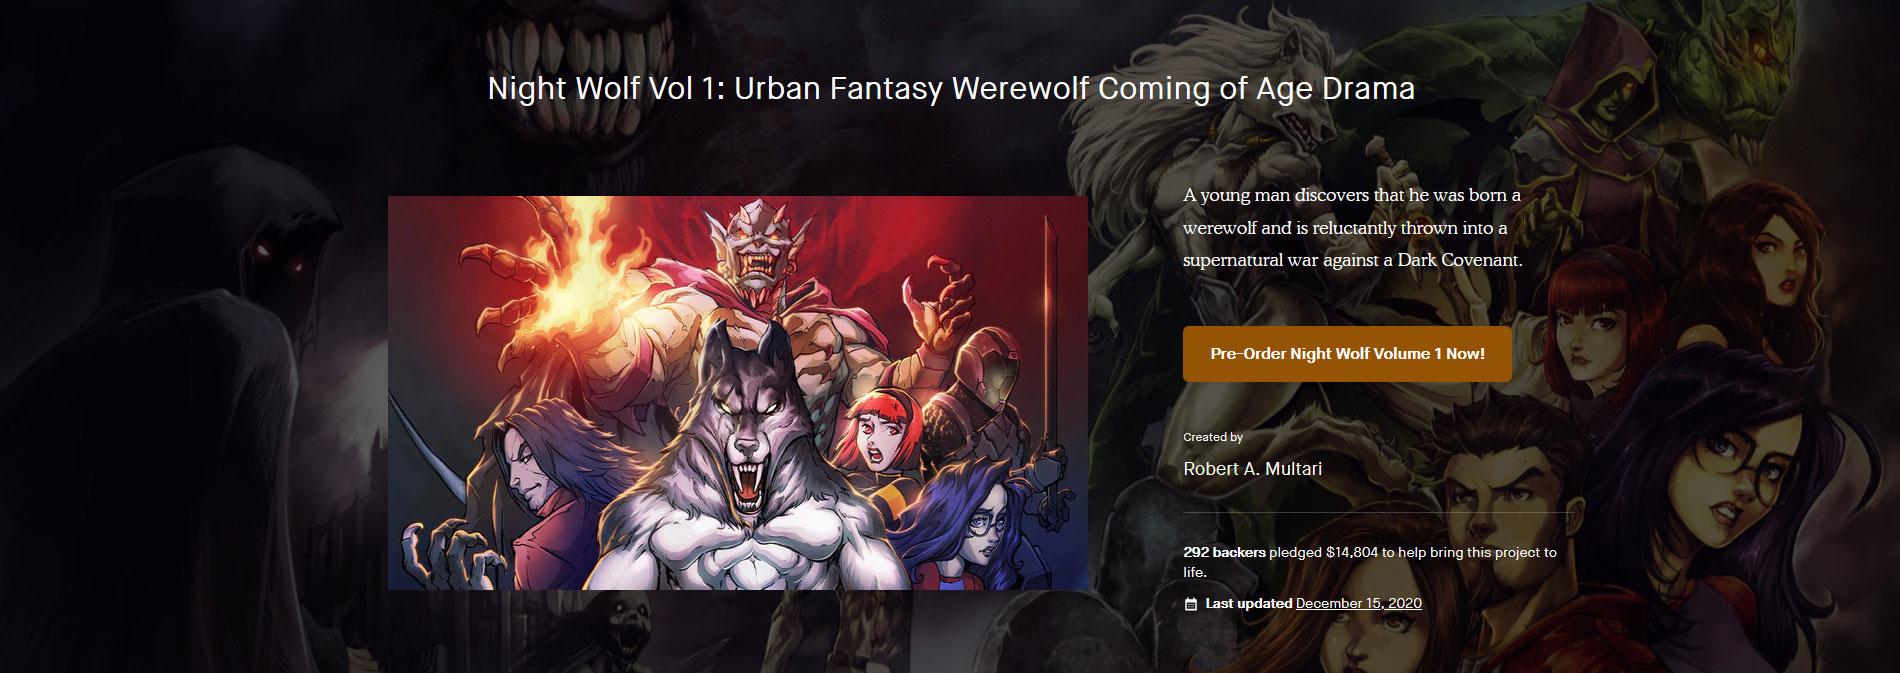 Night Wolf #1-4: Urban Fantasy Werewolf Coming of Age Drama Kickstarter